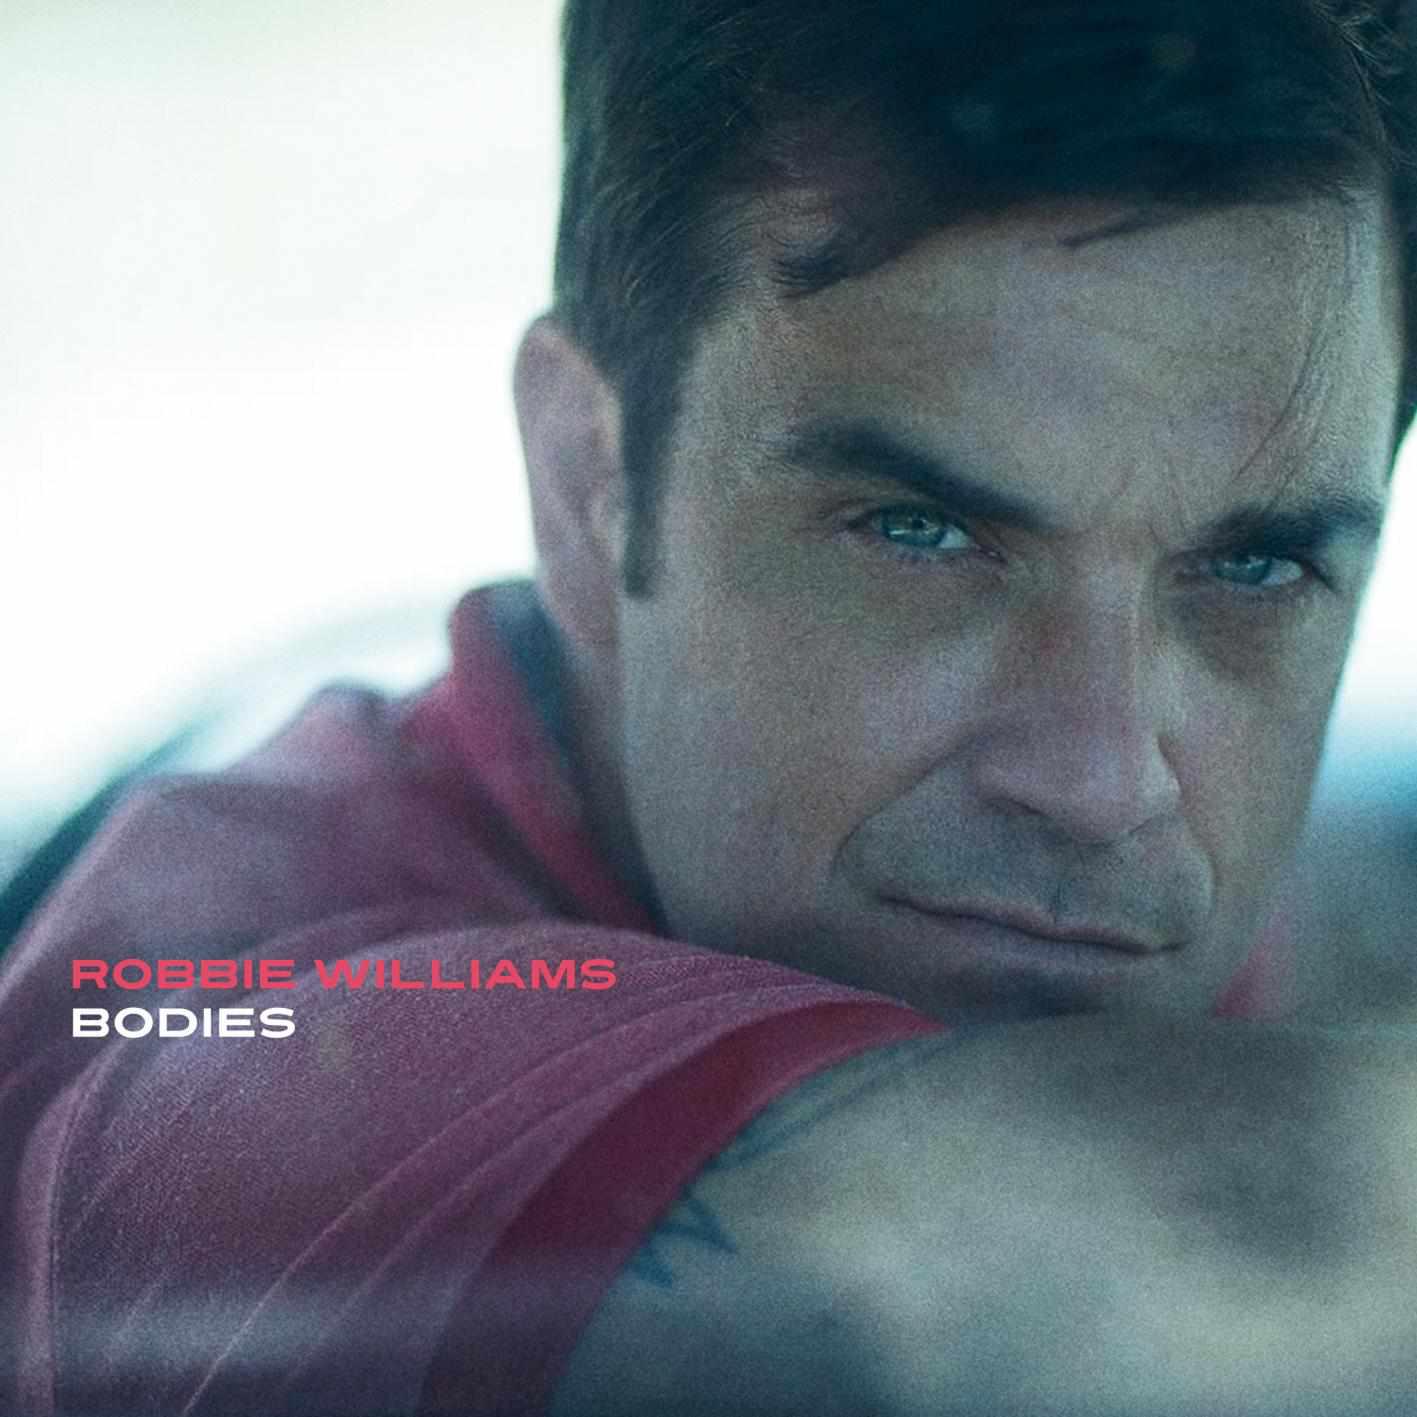 Robbie Williams Bodies